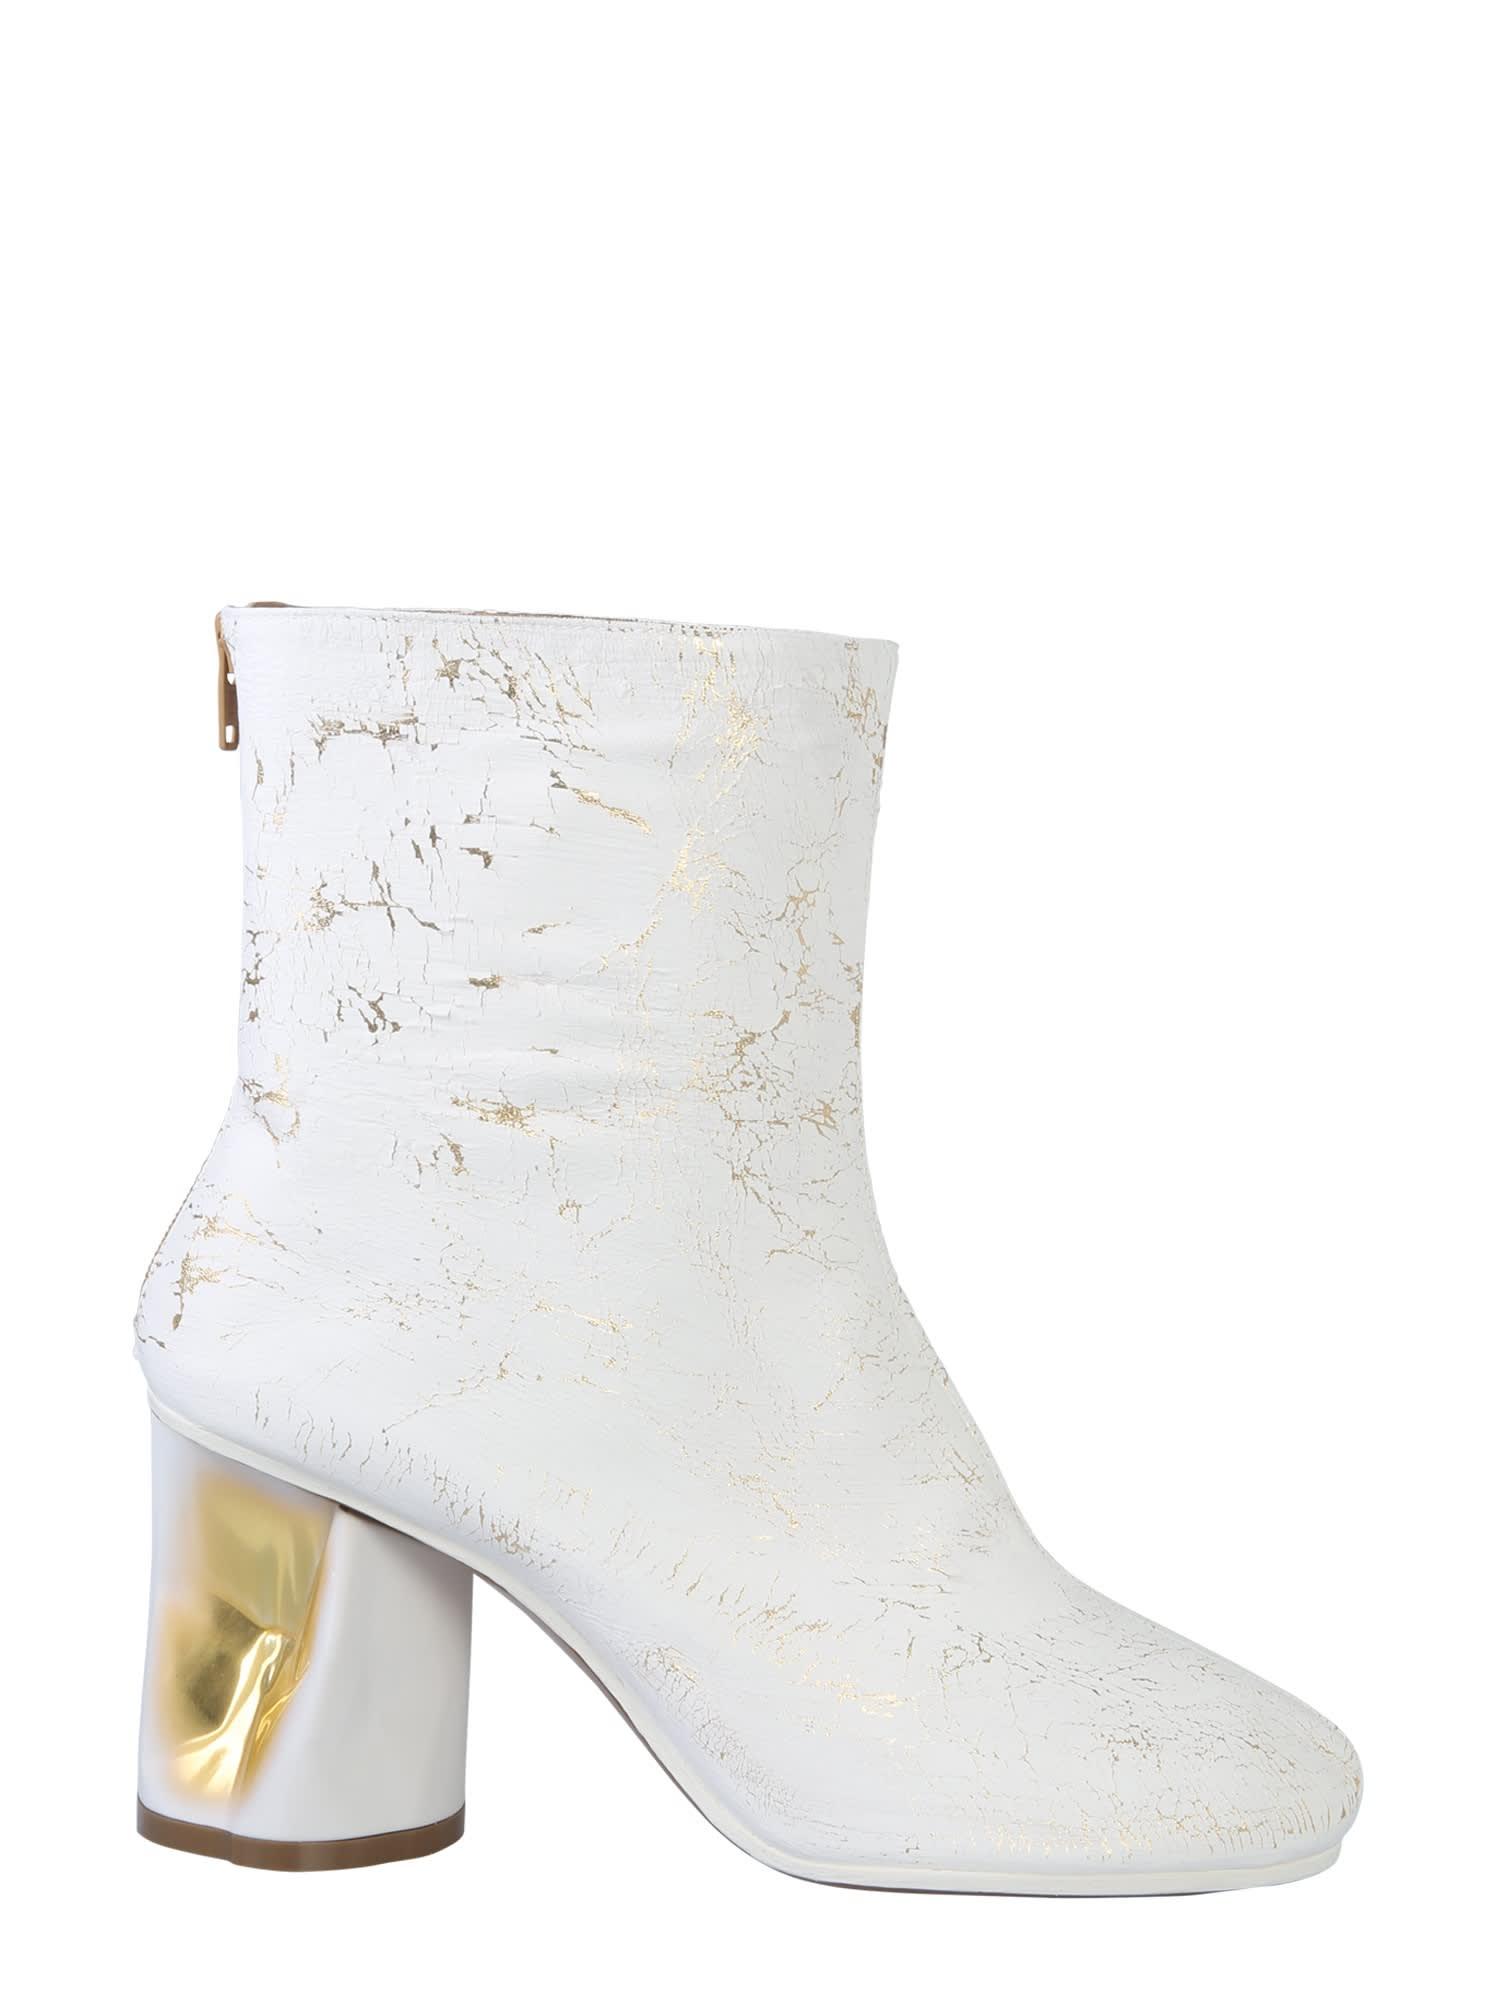 Buy Maison Margiela Crushed Heel Boot online, shop Maison Margiela shoes with free shipping